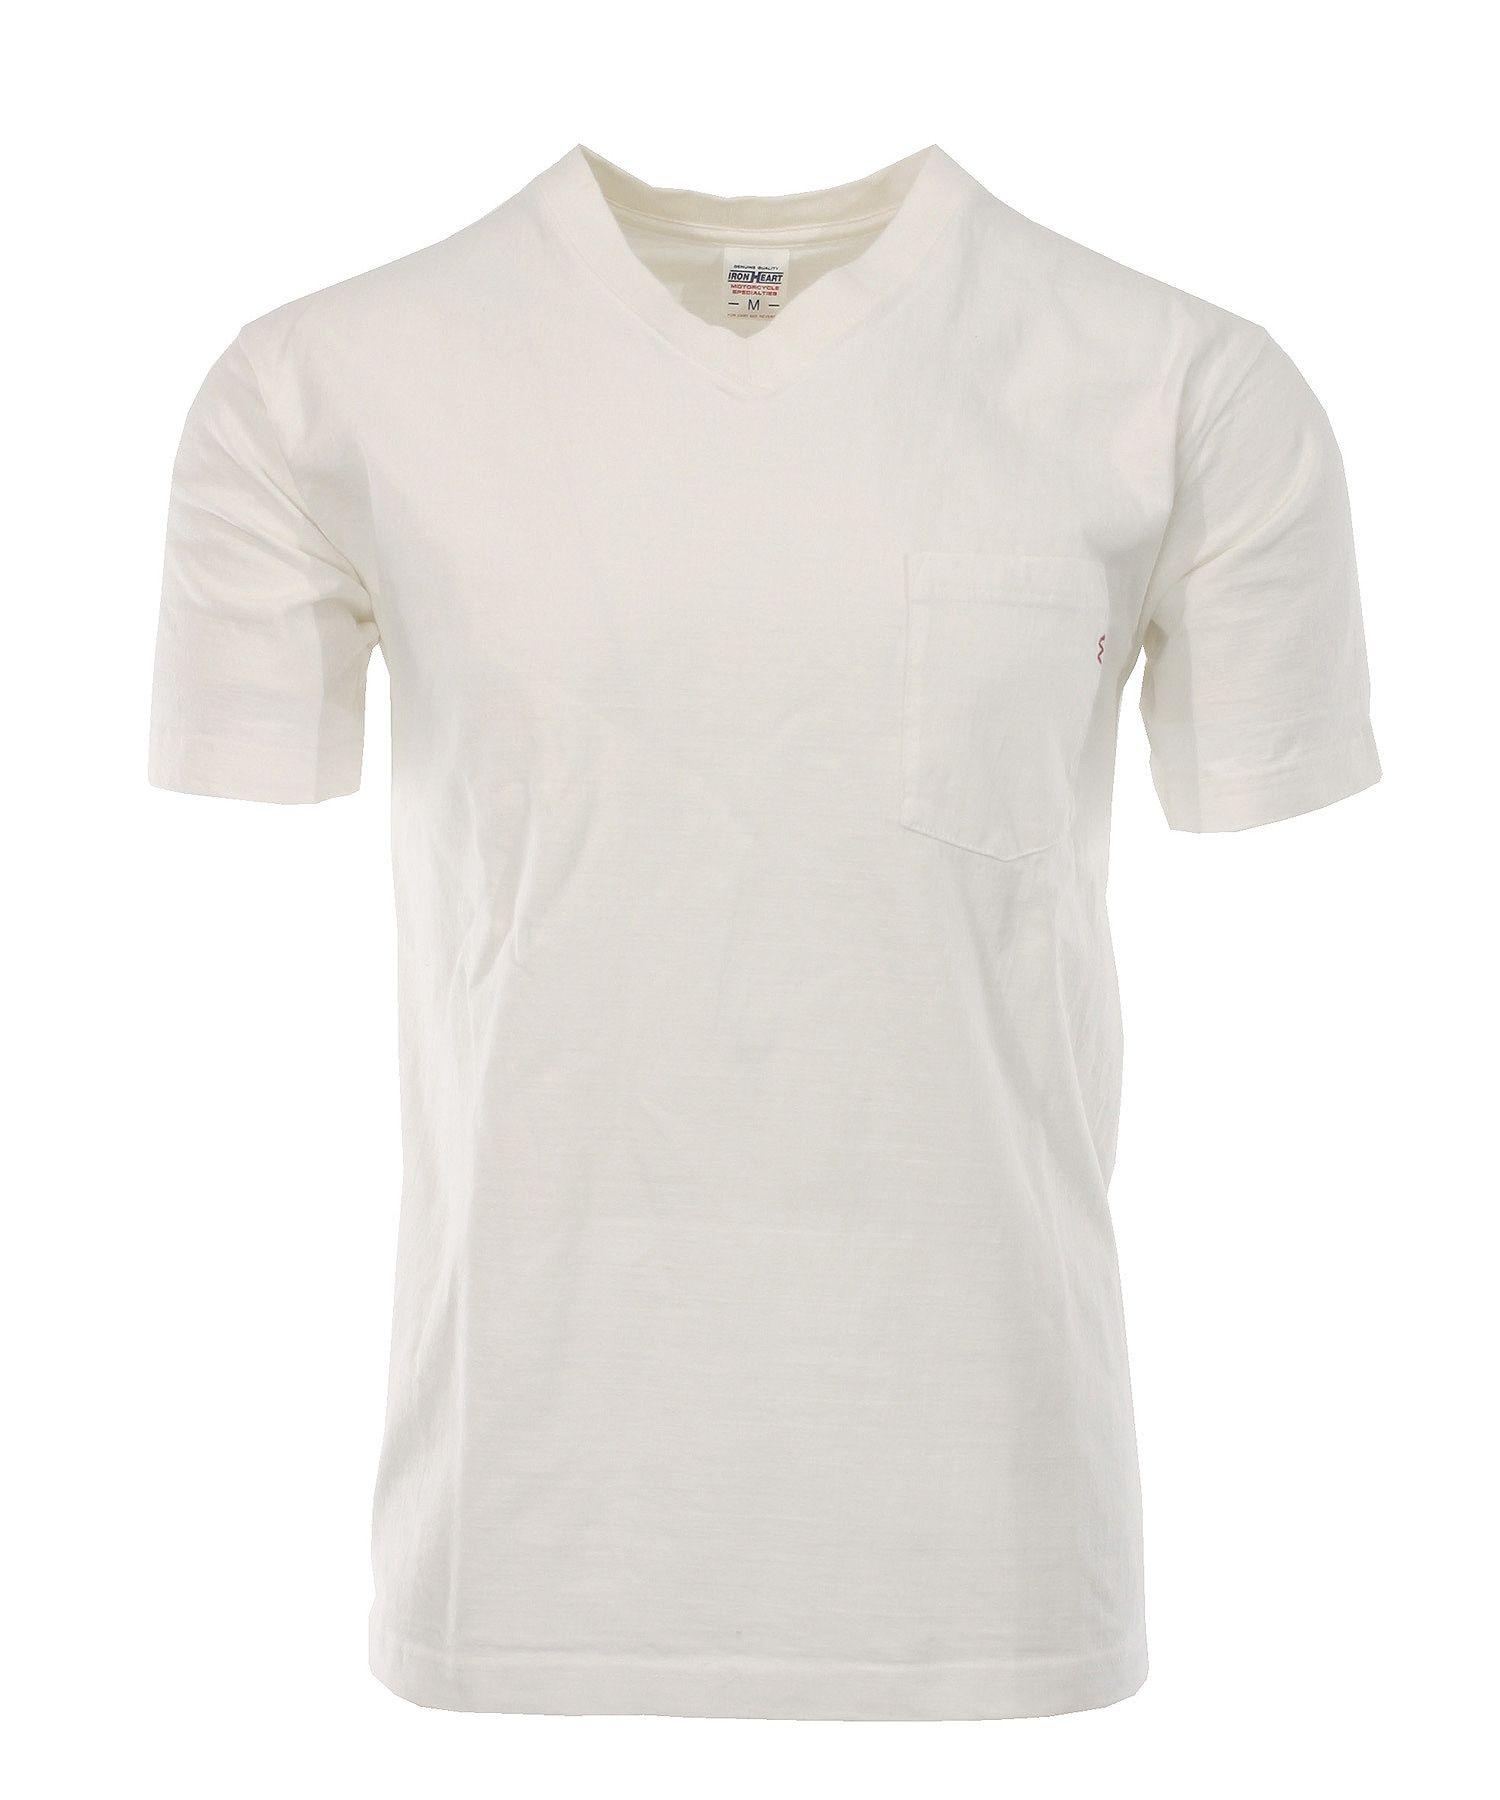 a5249da104 Iron Heart Plain V-Neck Loopwheeled Pocket T-Shirt aus 7